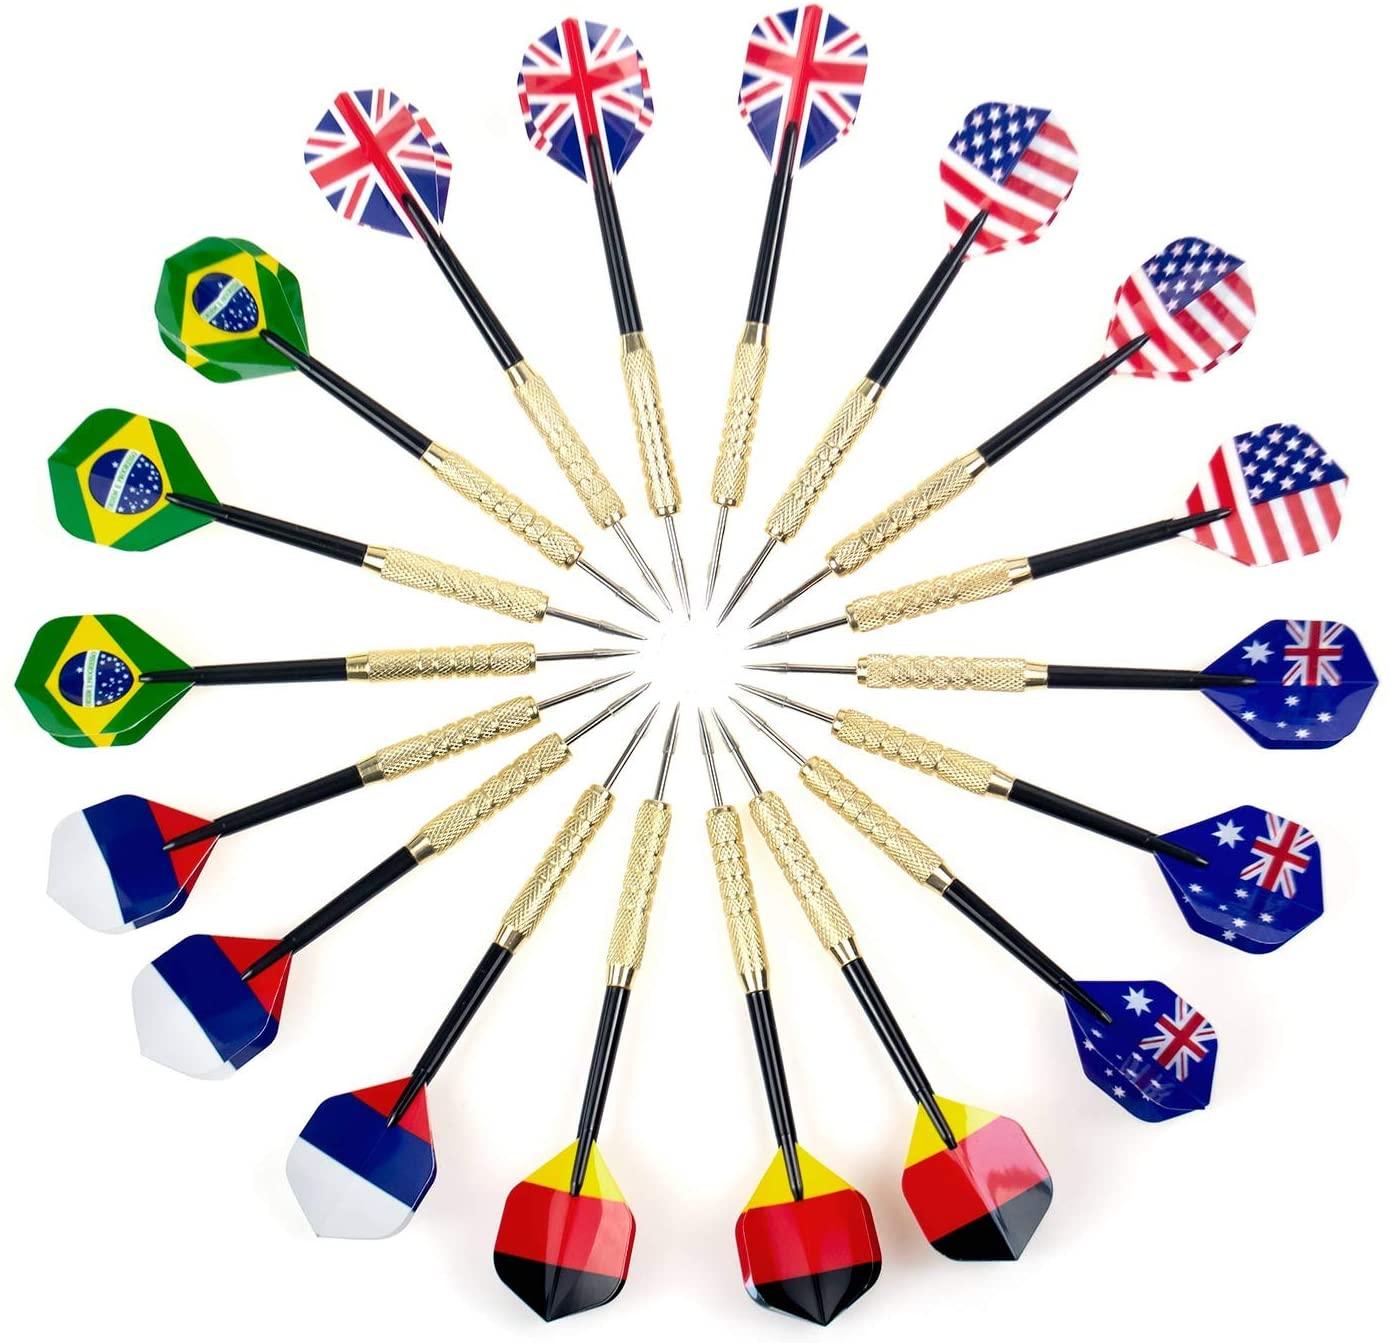 Addmotor Steel Tip Darts 18 Packs, Professional Metal Darts, Detachable Steel Darts, National Flag